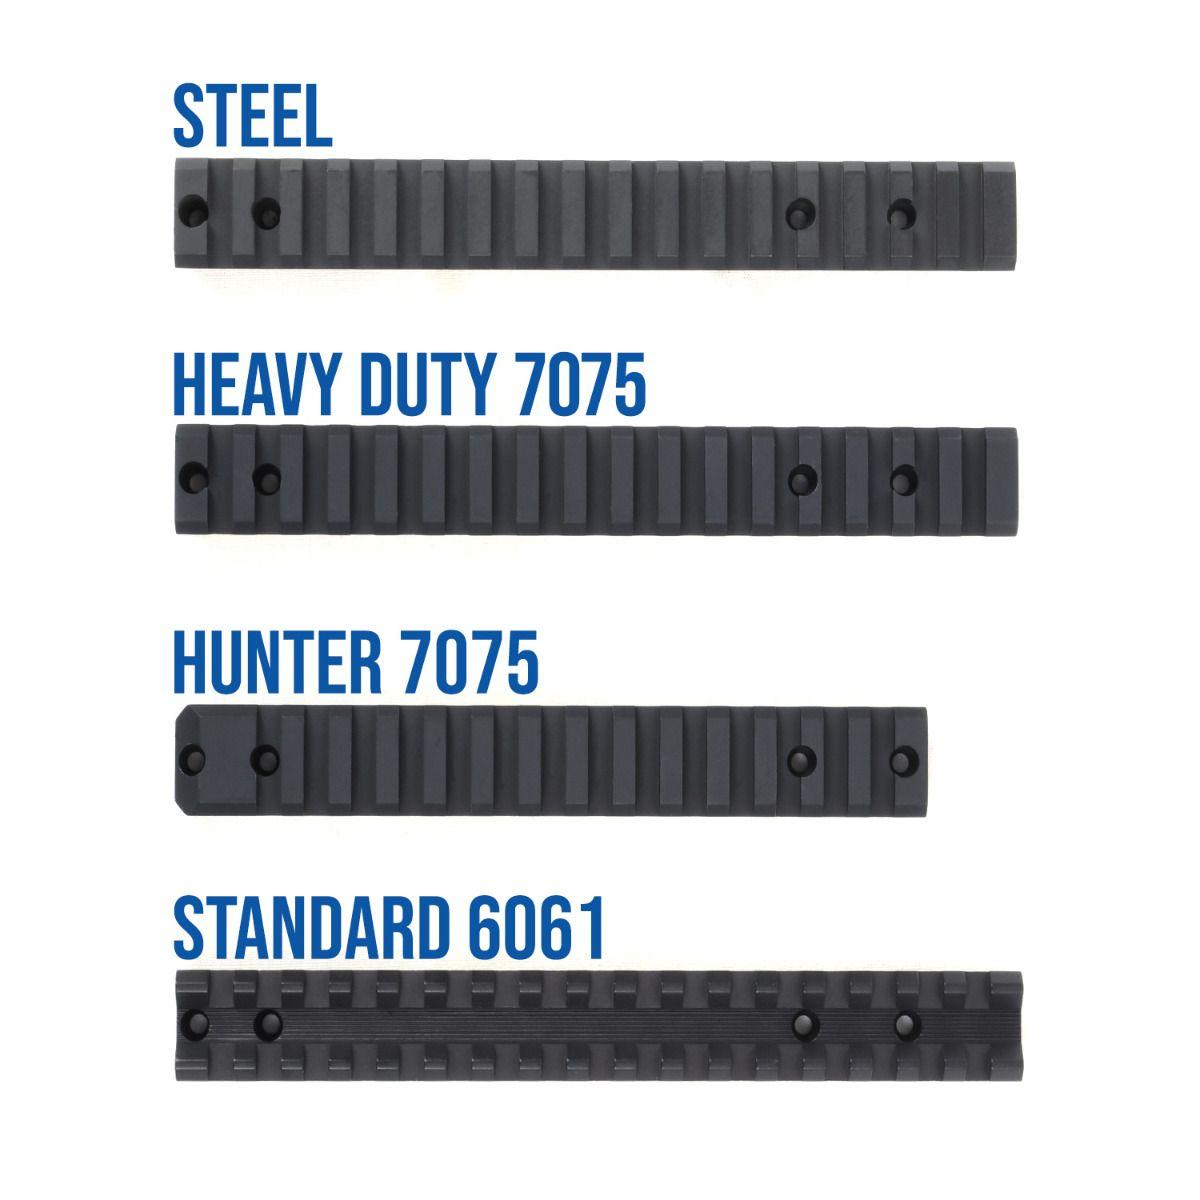 Hunter Series Savage Axis Picatinny Rail 20 MOA